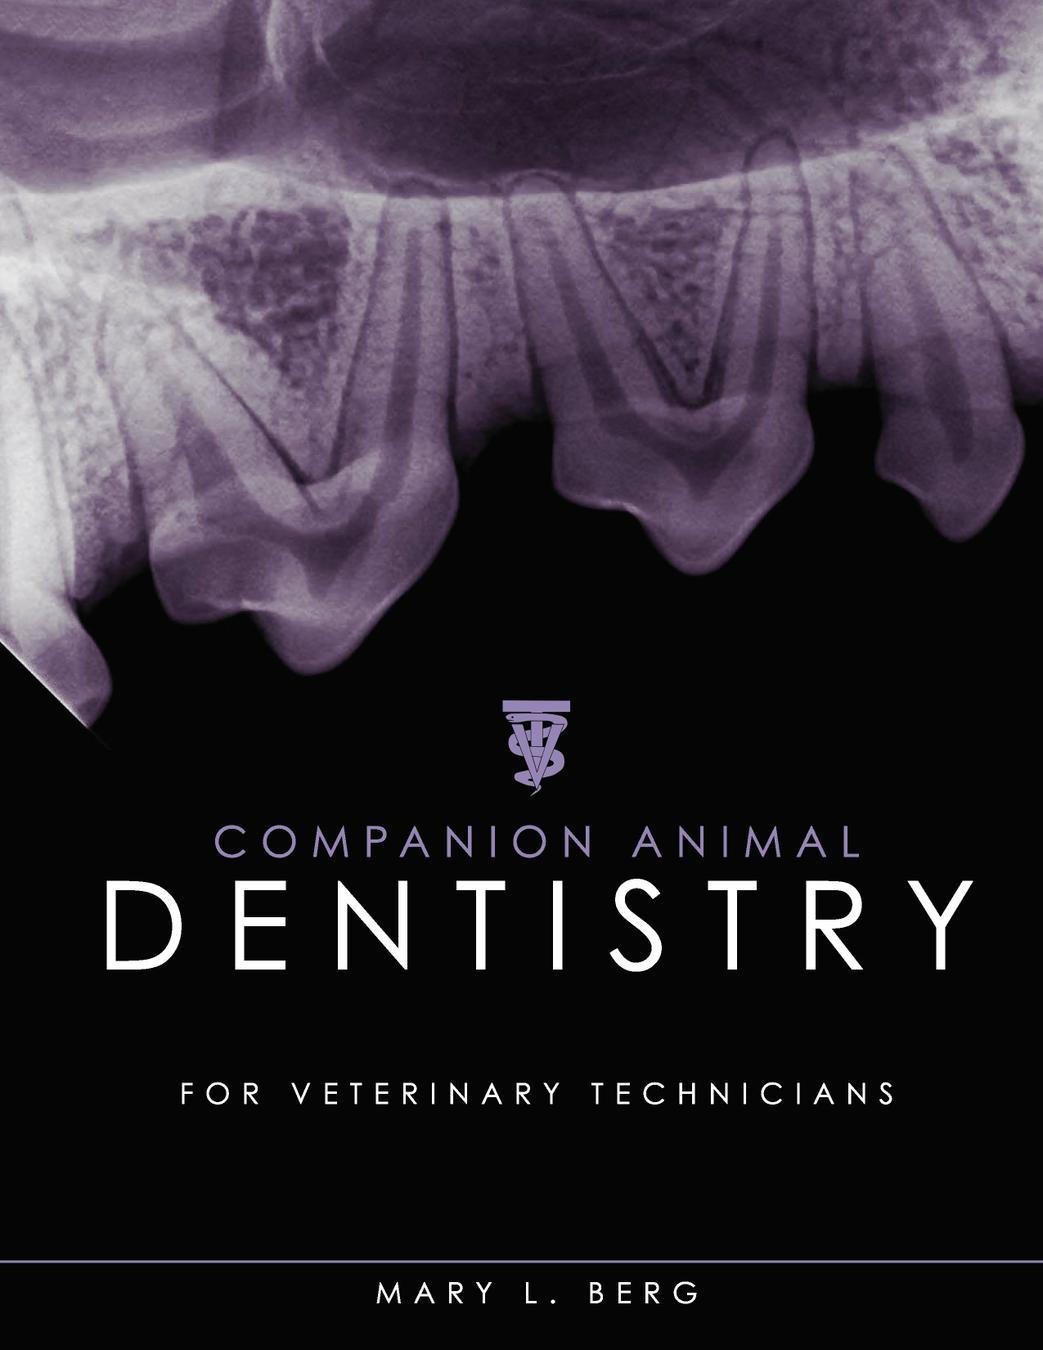 Companion Animal Dentistry for Veterinary Technicians